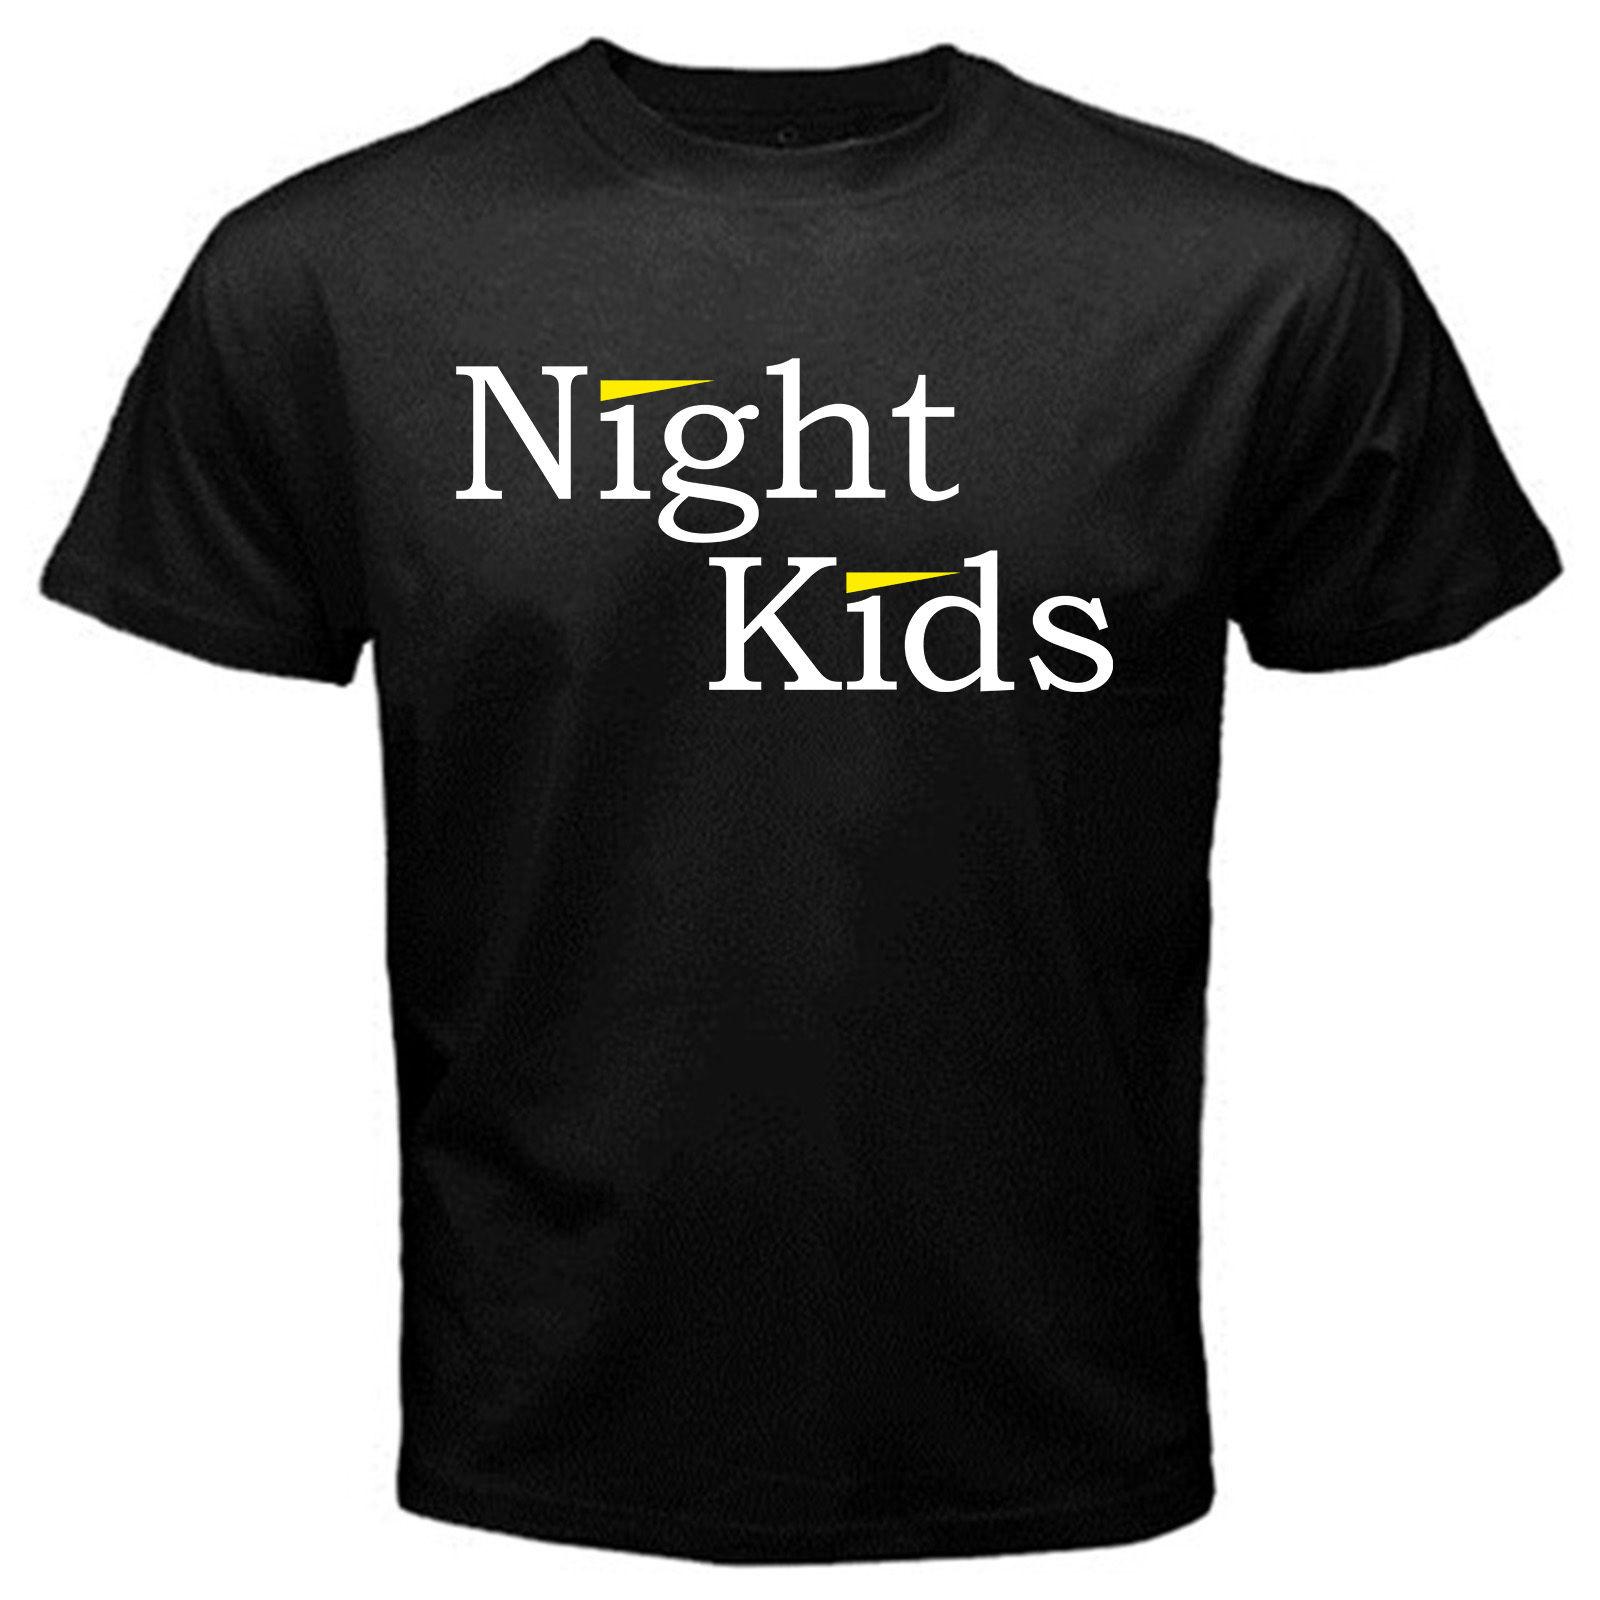 Night Kids initial D anime manga japan tofu myogi shop T-Shirt Black Hot New 2018 Summer Fashion T Shirts Loose top tee